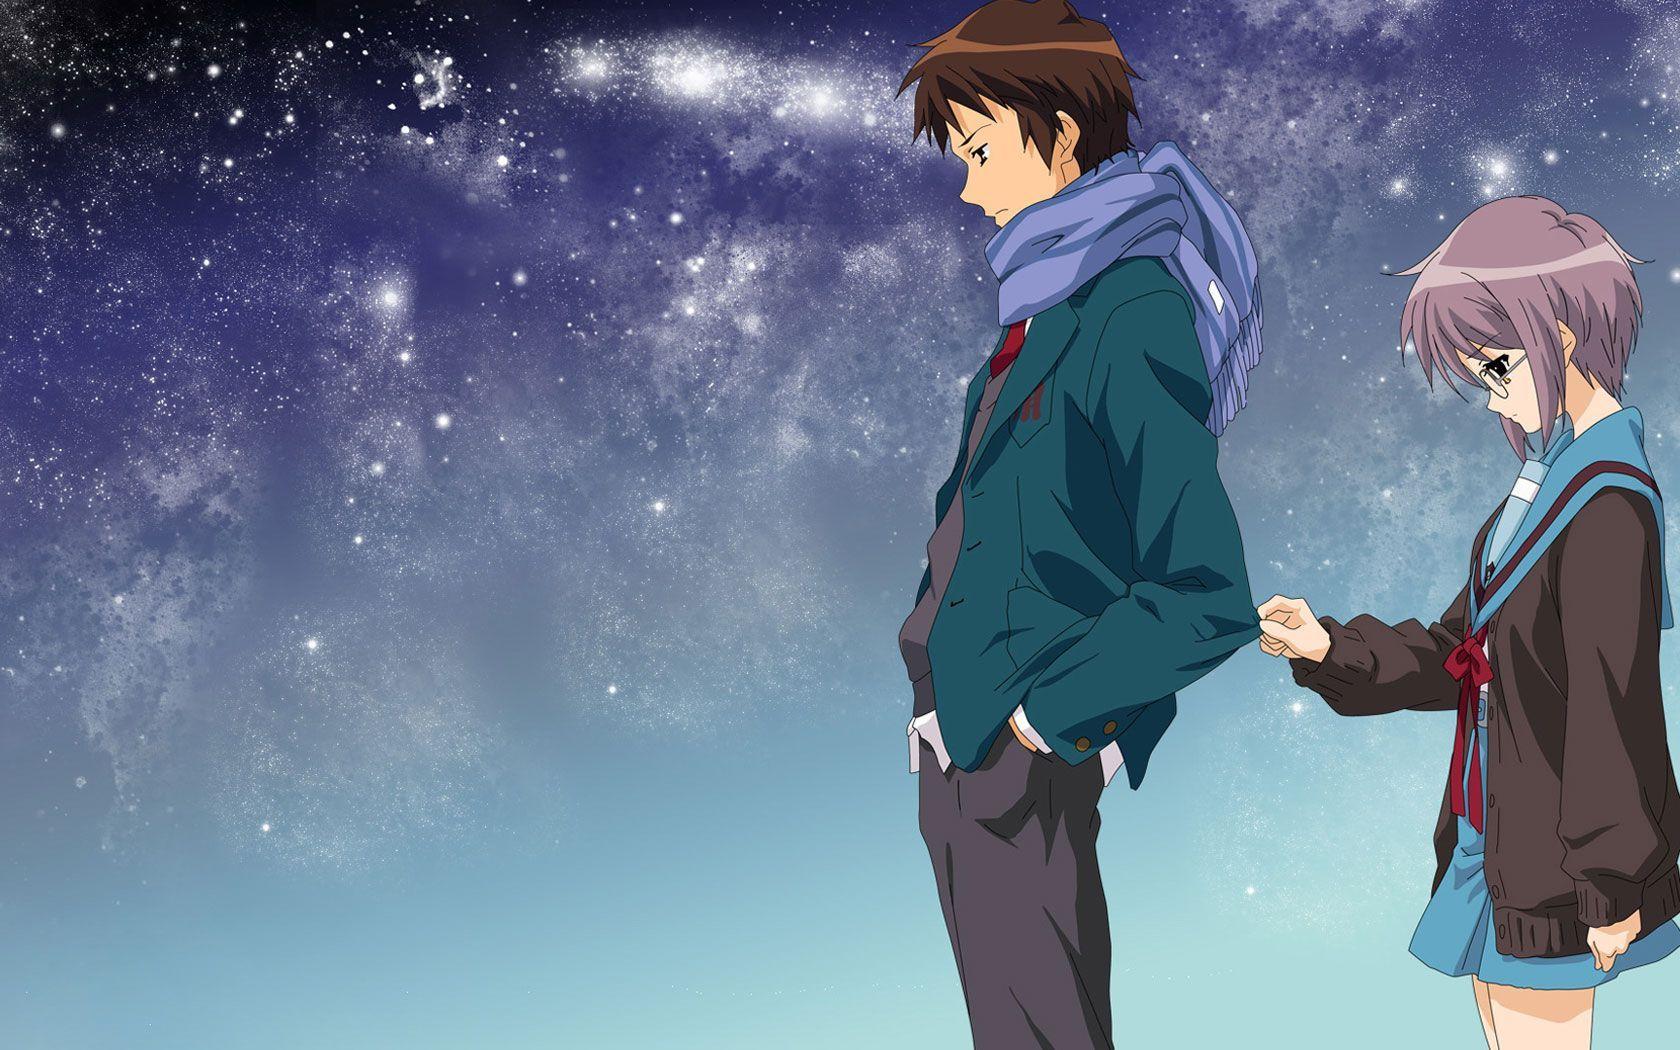 Hd Couple Wallpaper Anime Amazing Wallpaper Hd Library